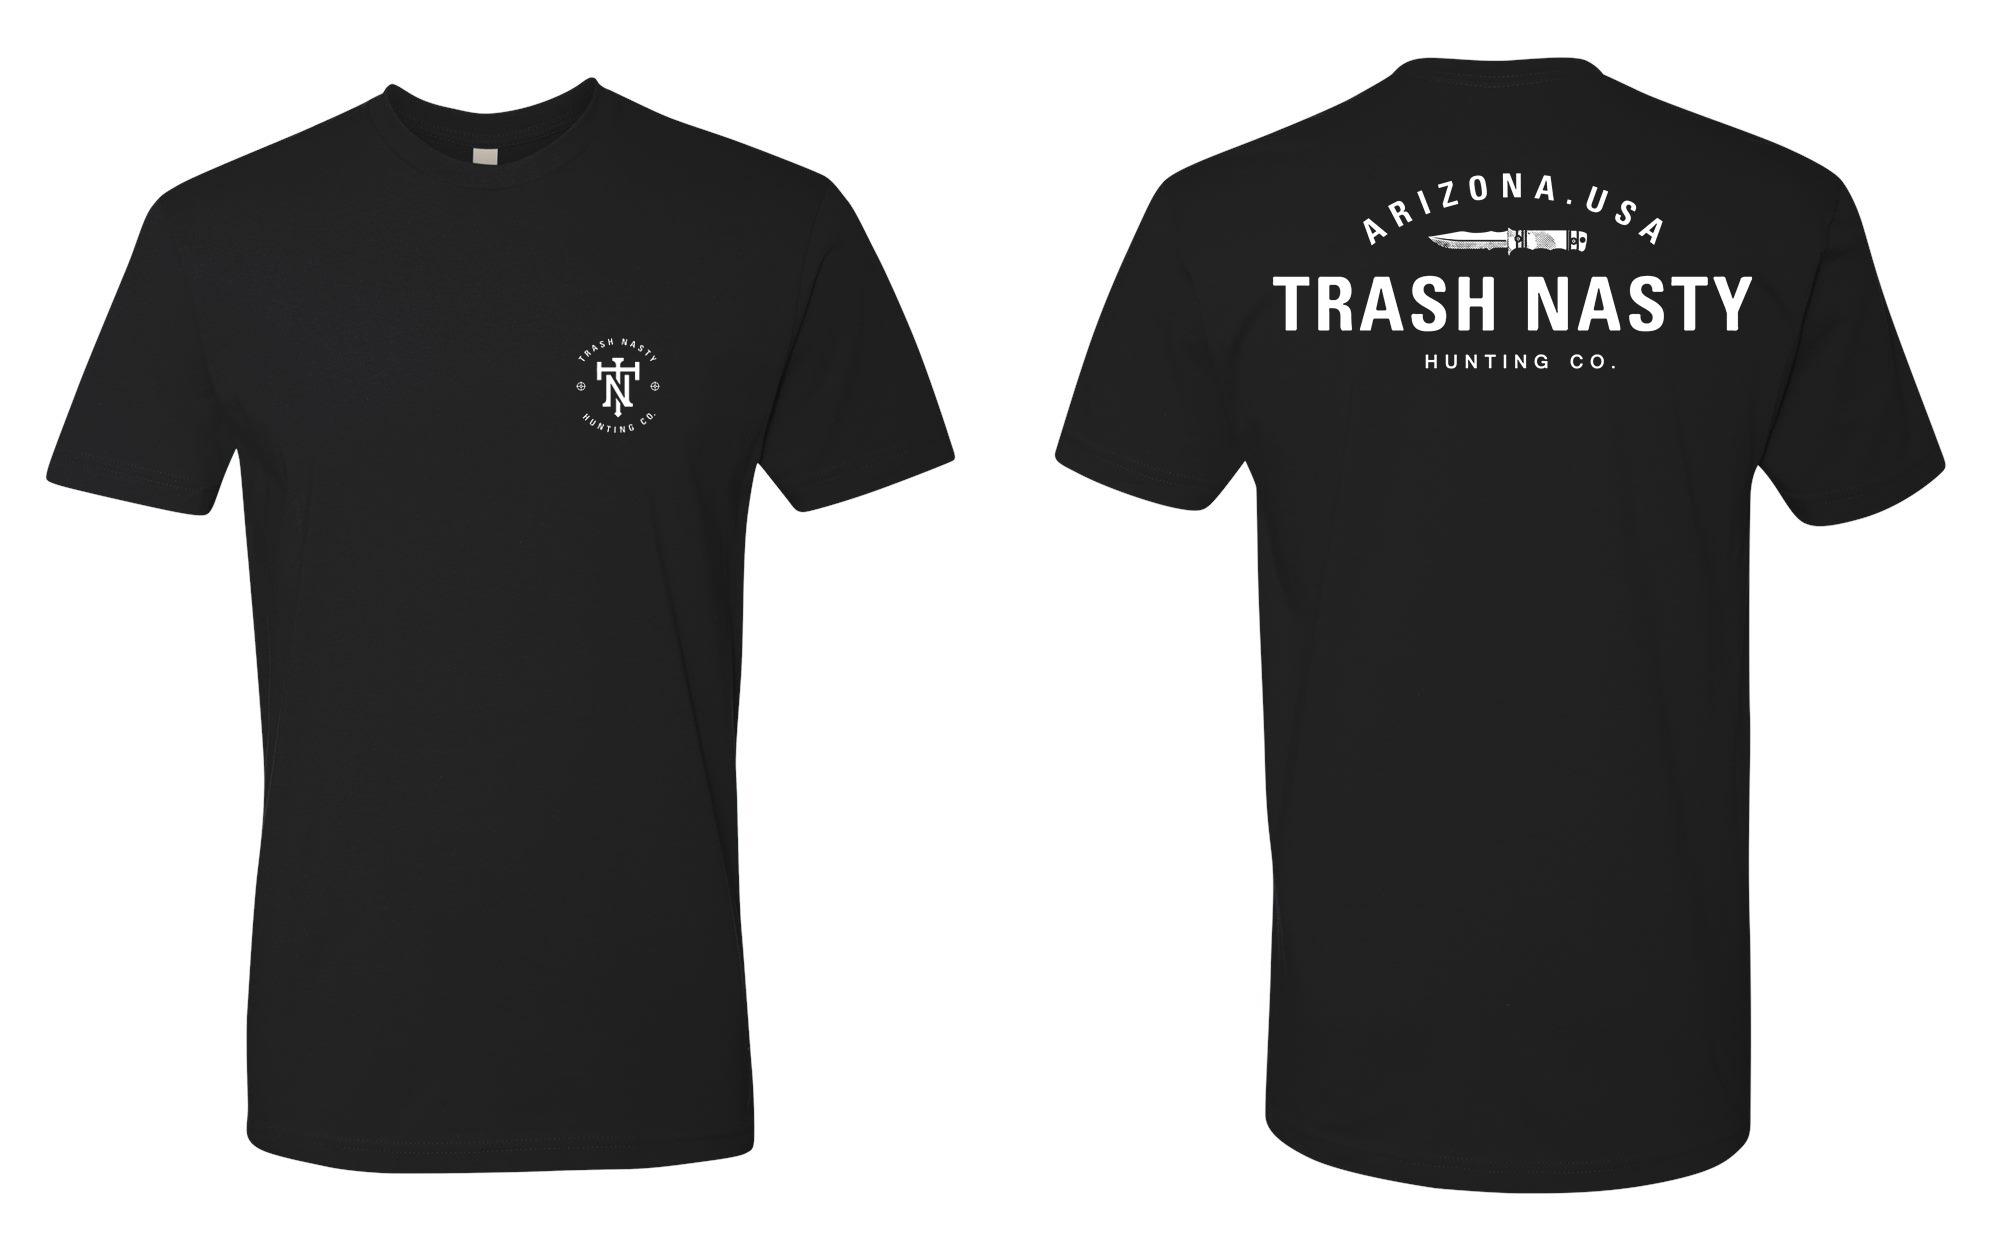 Trash Nasty Hunting Co_TN Sightmark Arizona USA White_MOCKUP (NLA 3600_Black) UPDATE.jpg